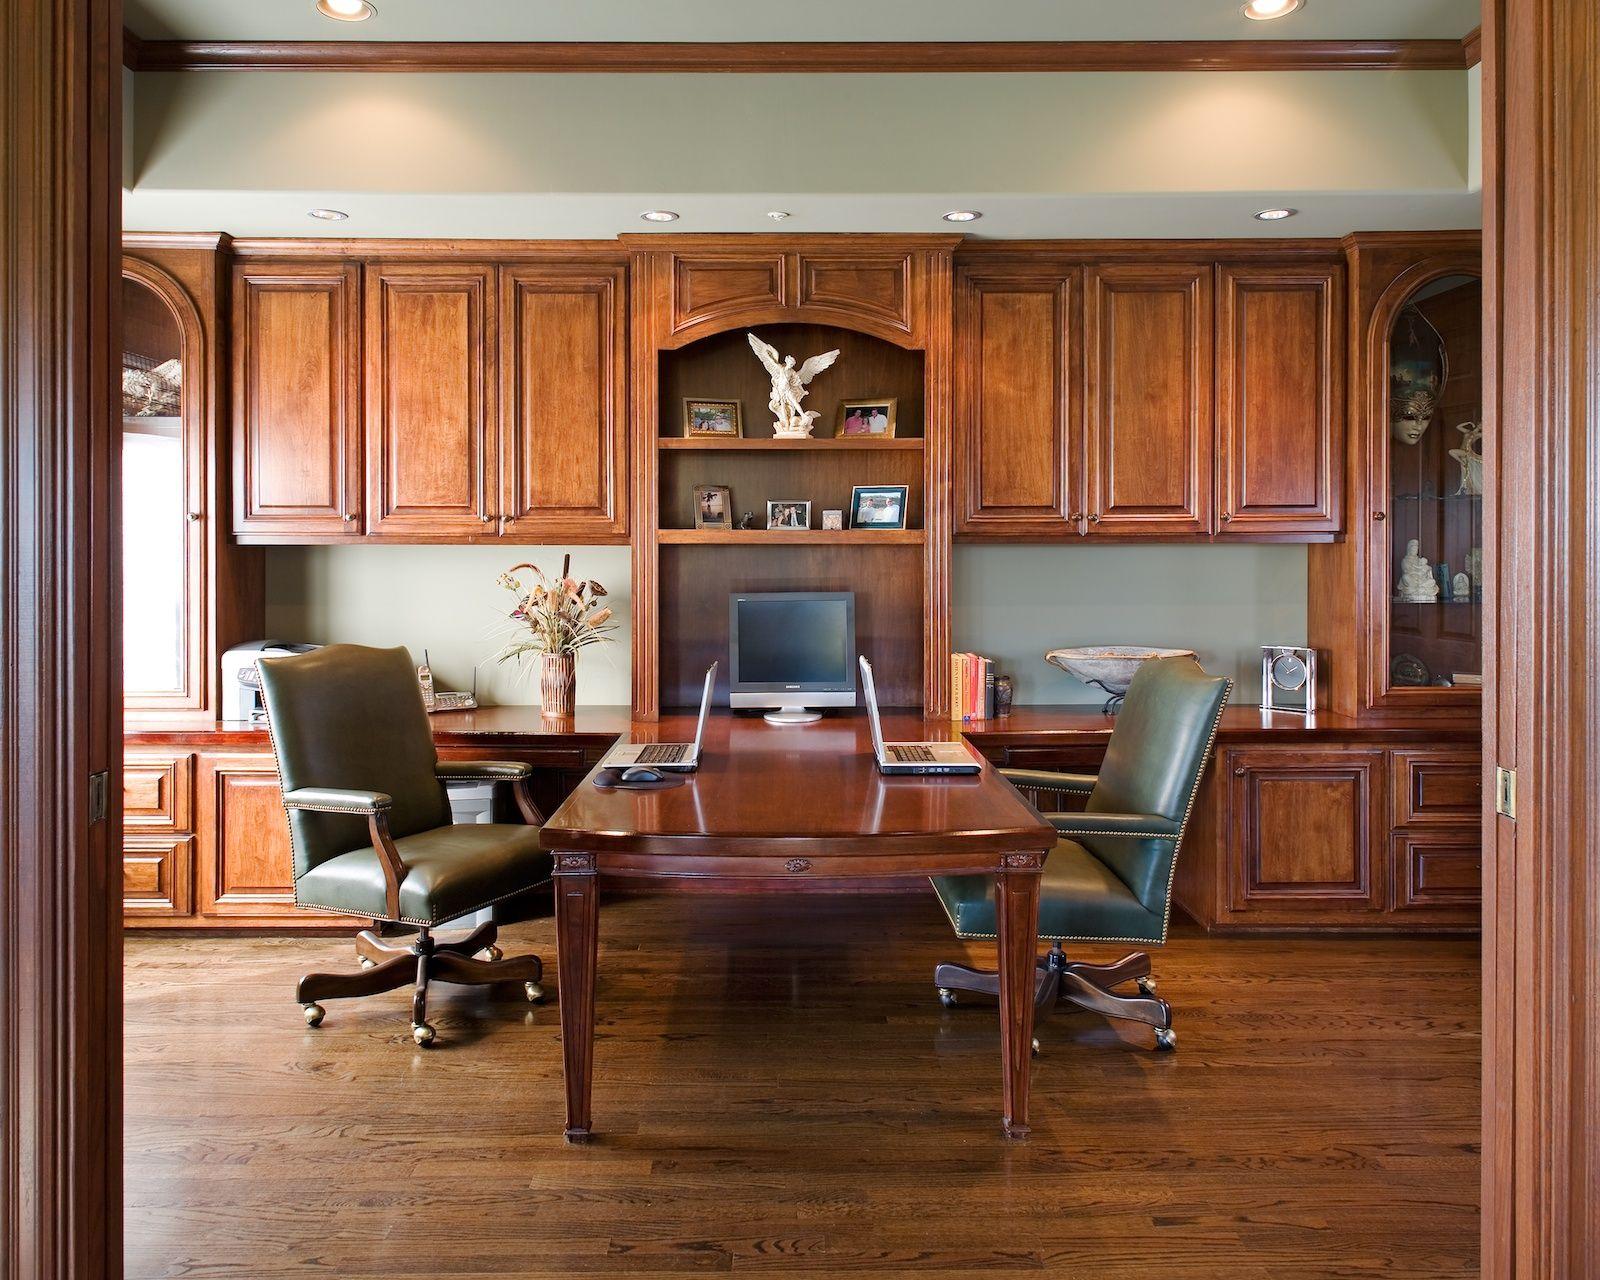 Home fice Designs For Two Small Modern Home fice Design Designs